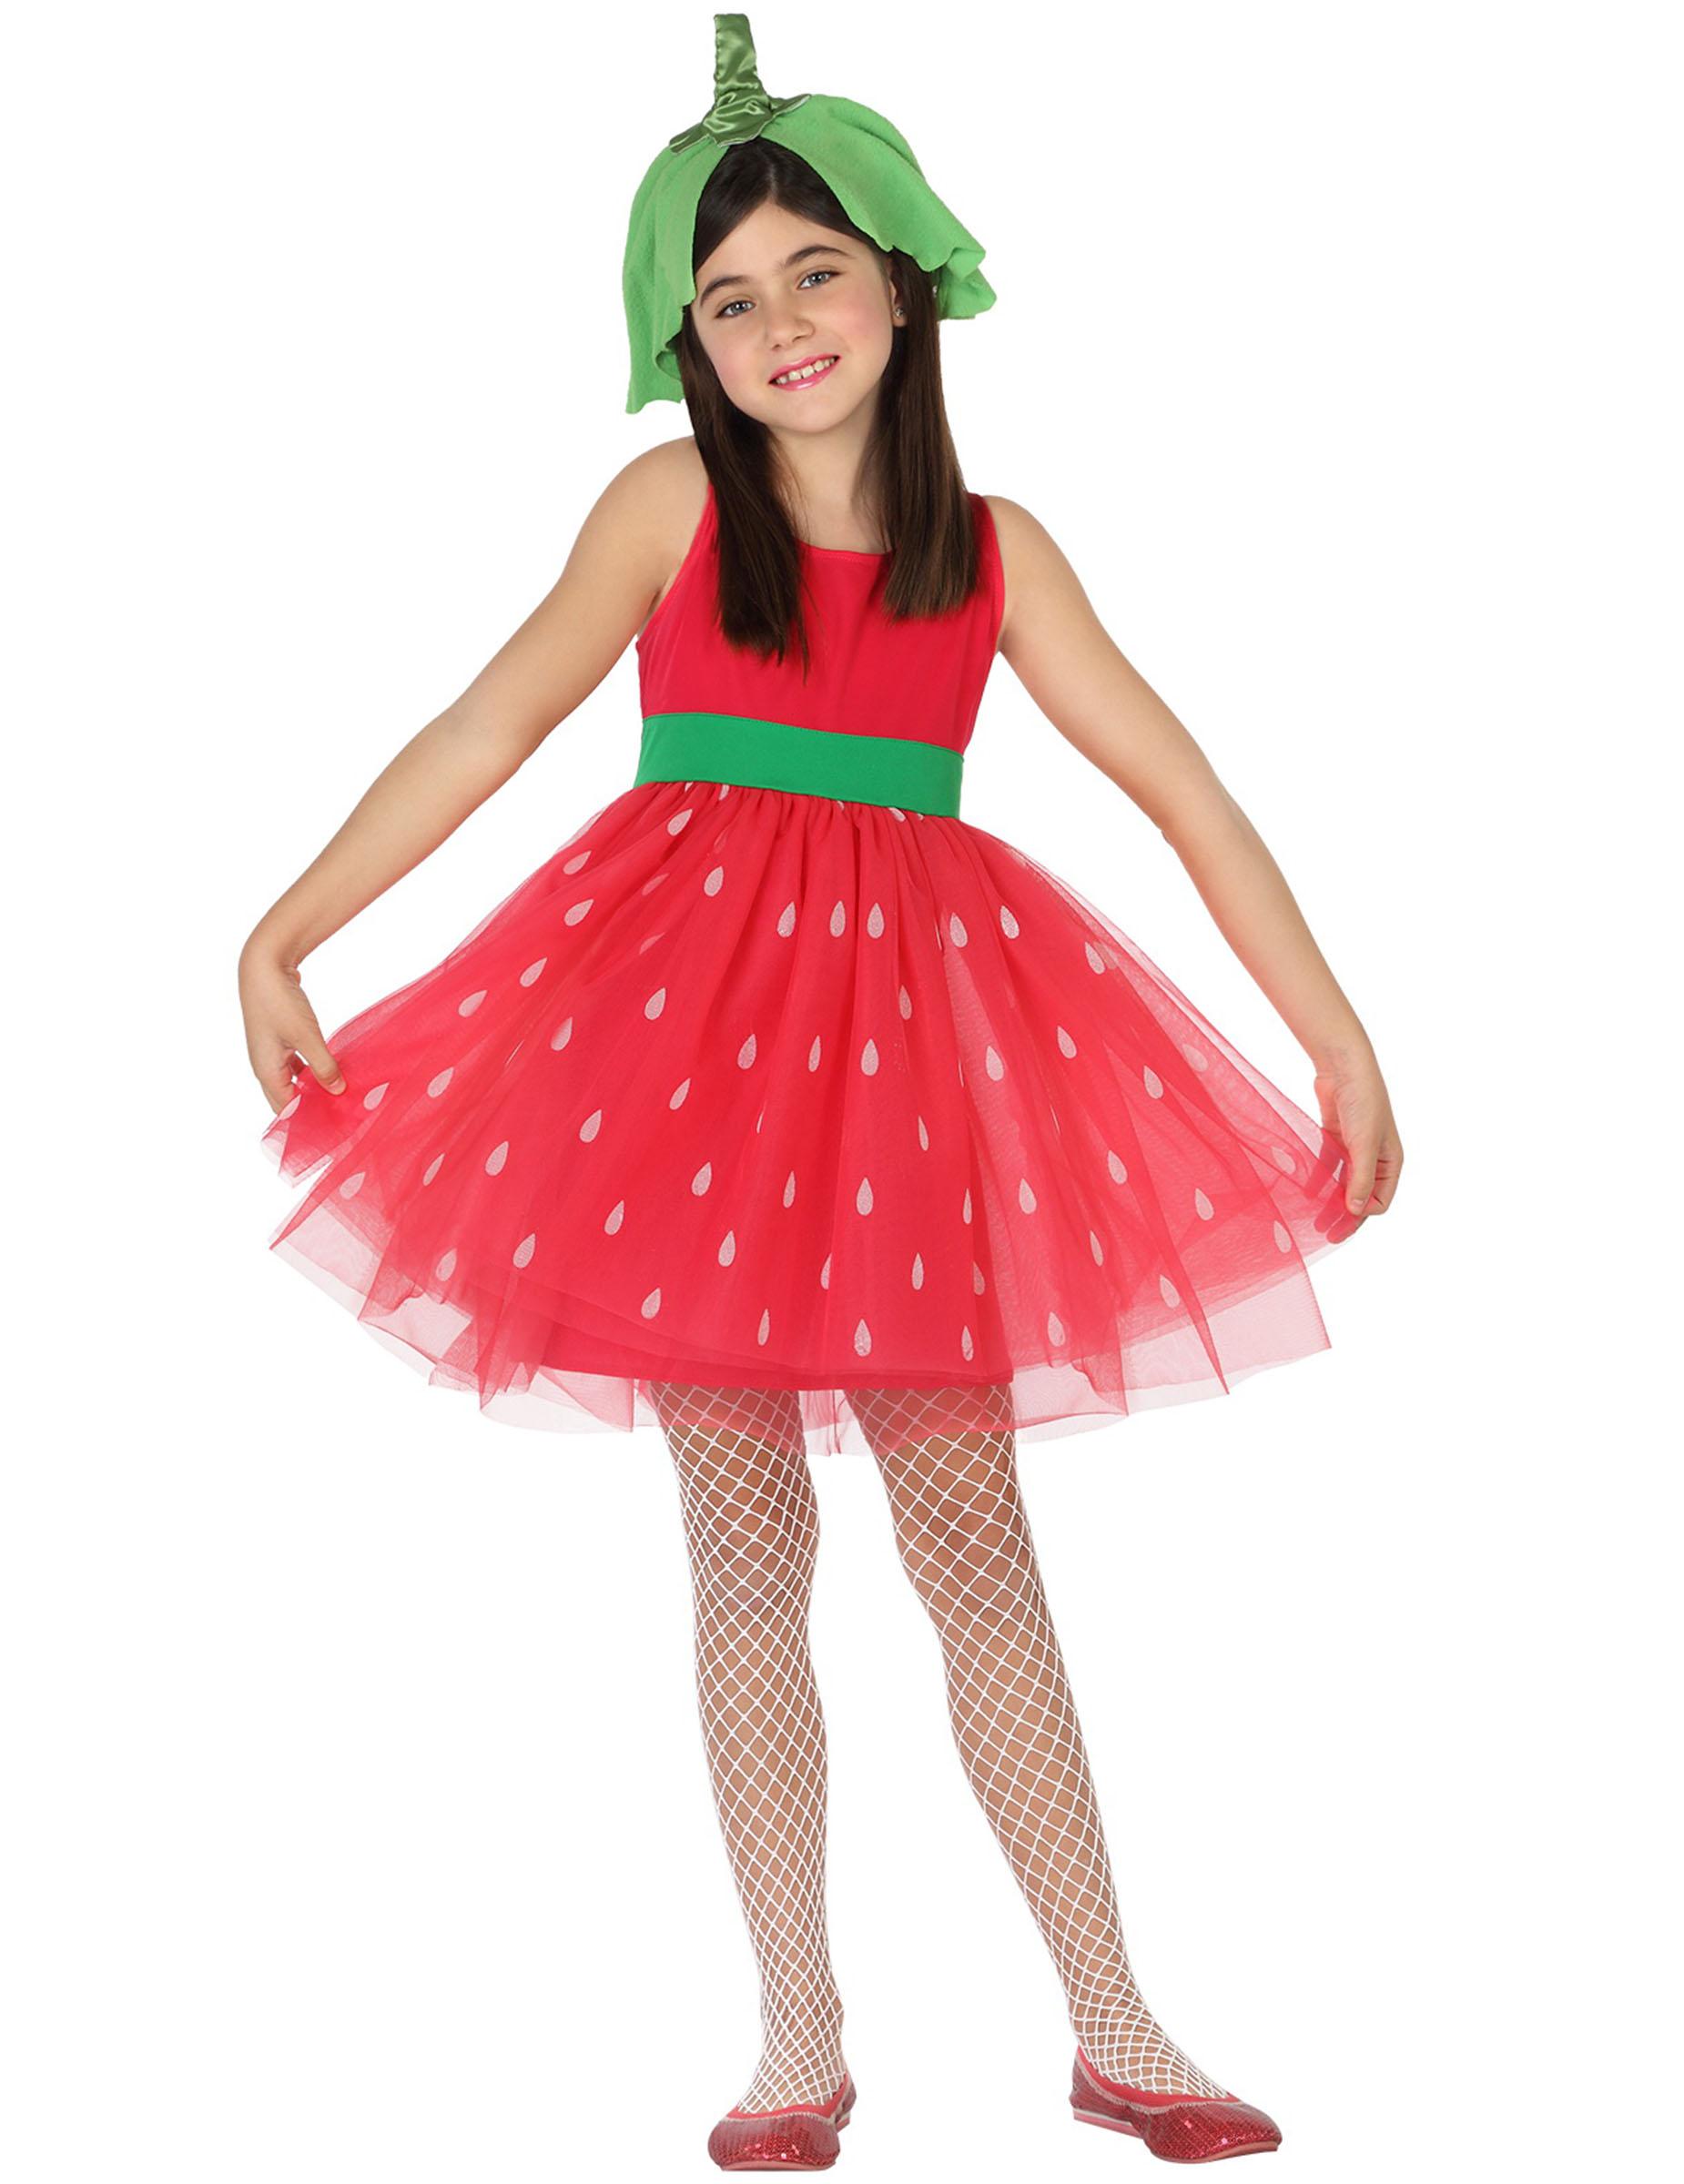 Erdbeer Kostum Fur Madchen Rot Weiss Grun Gunstige Faschings